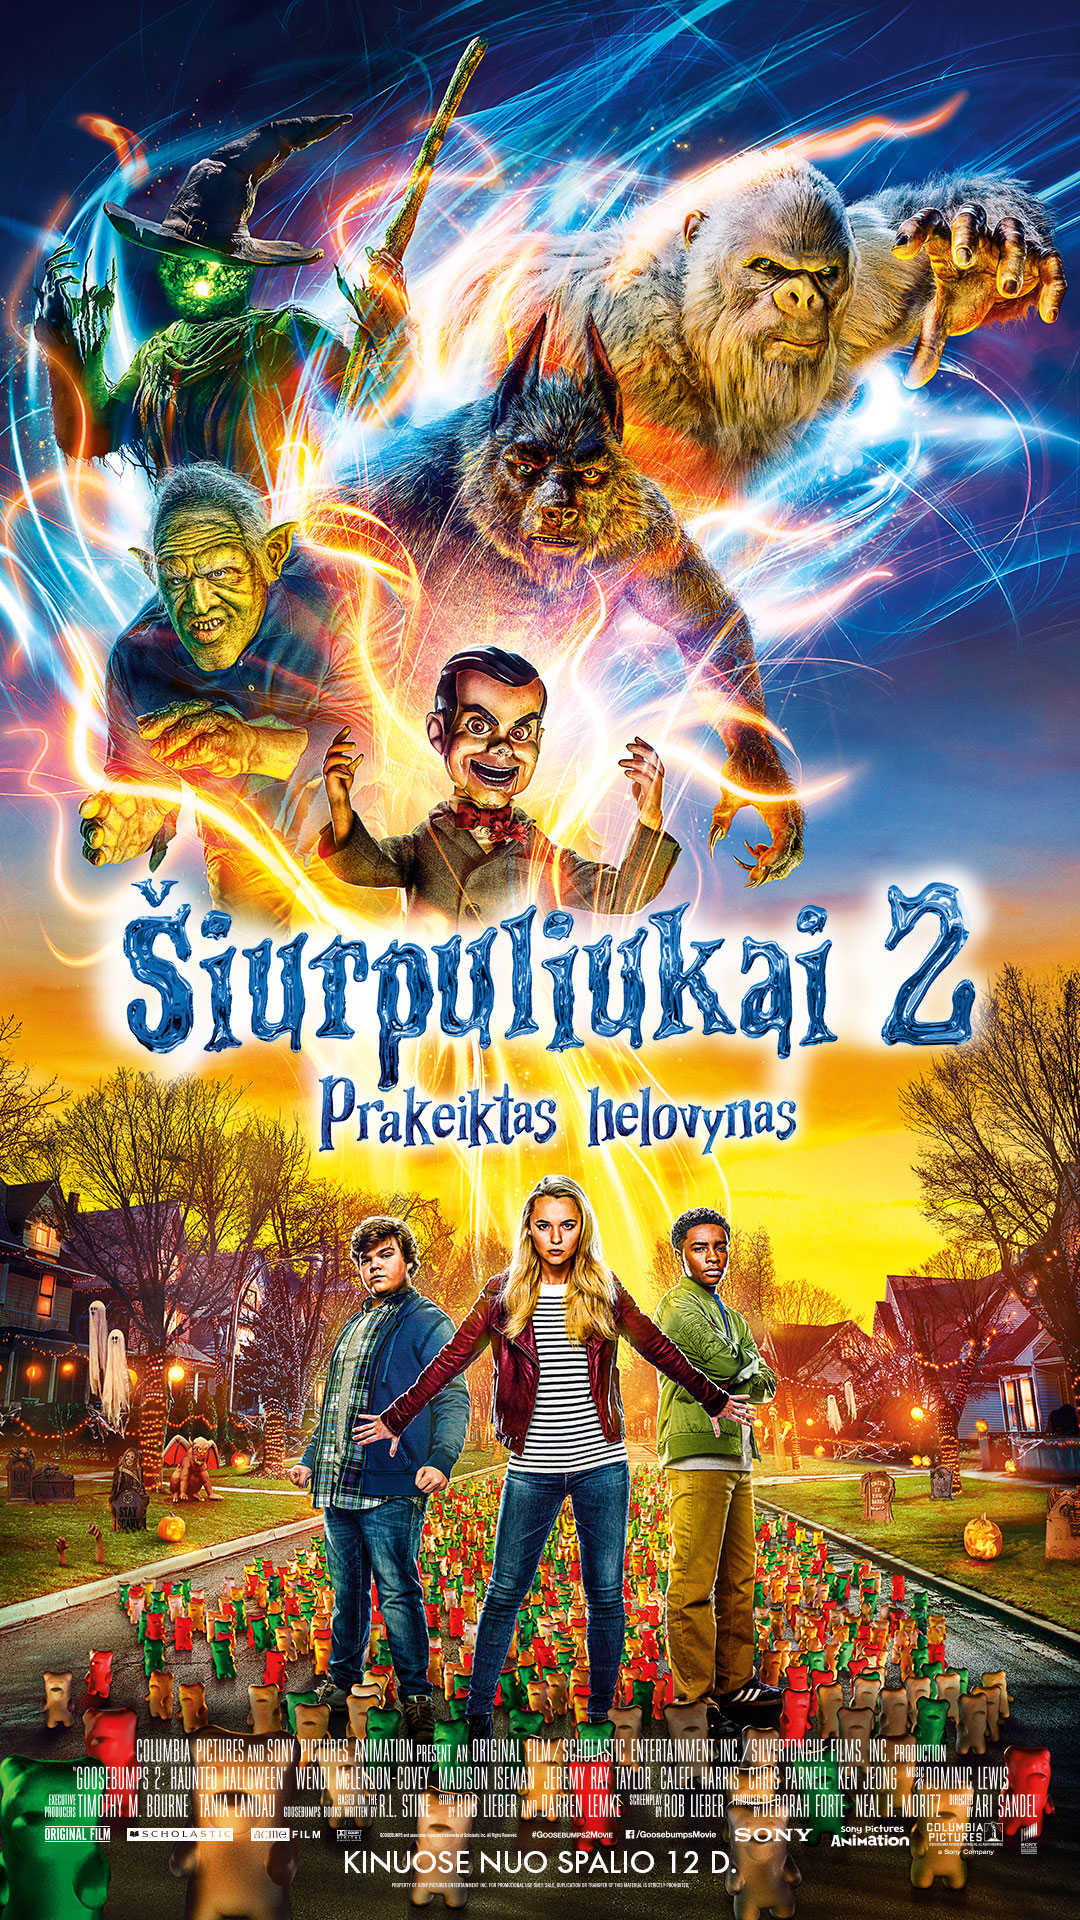 ŠIURPULIUKAI 2 (GOOSEBUMPS 2: HAUNTED HALLOWEEN)